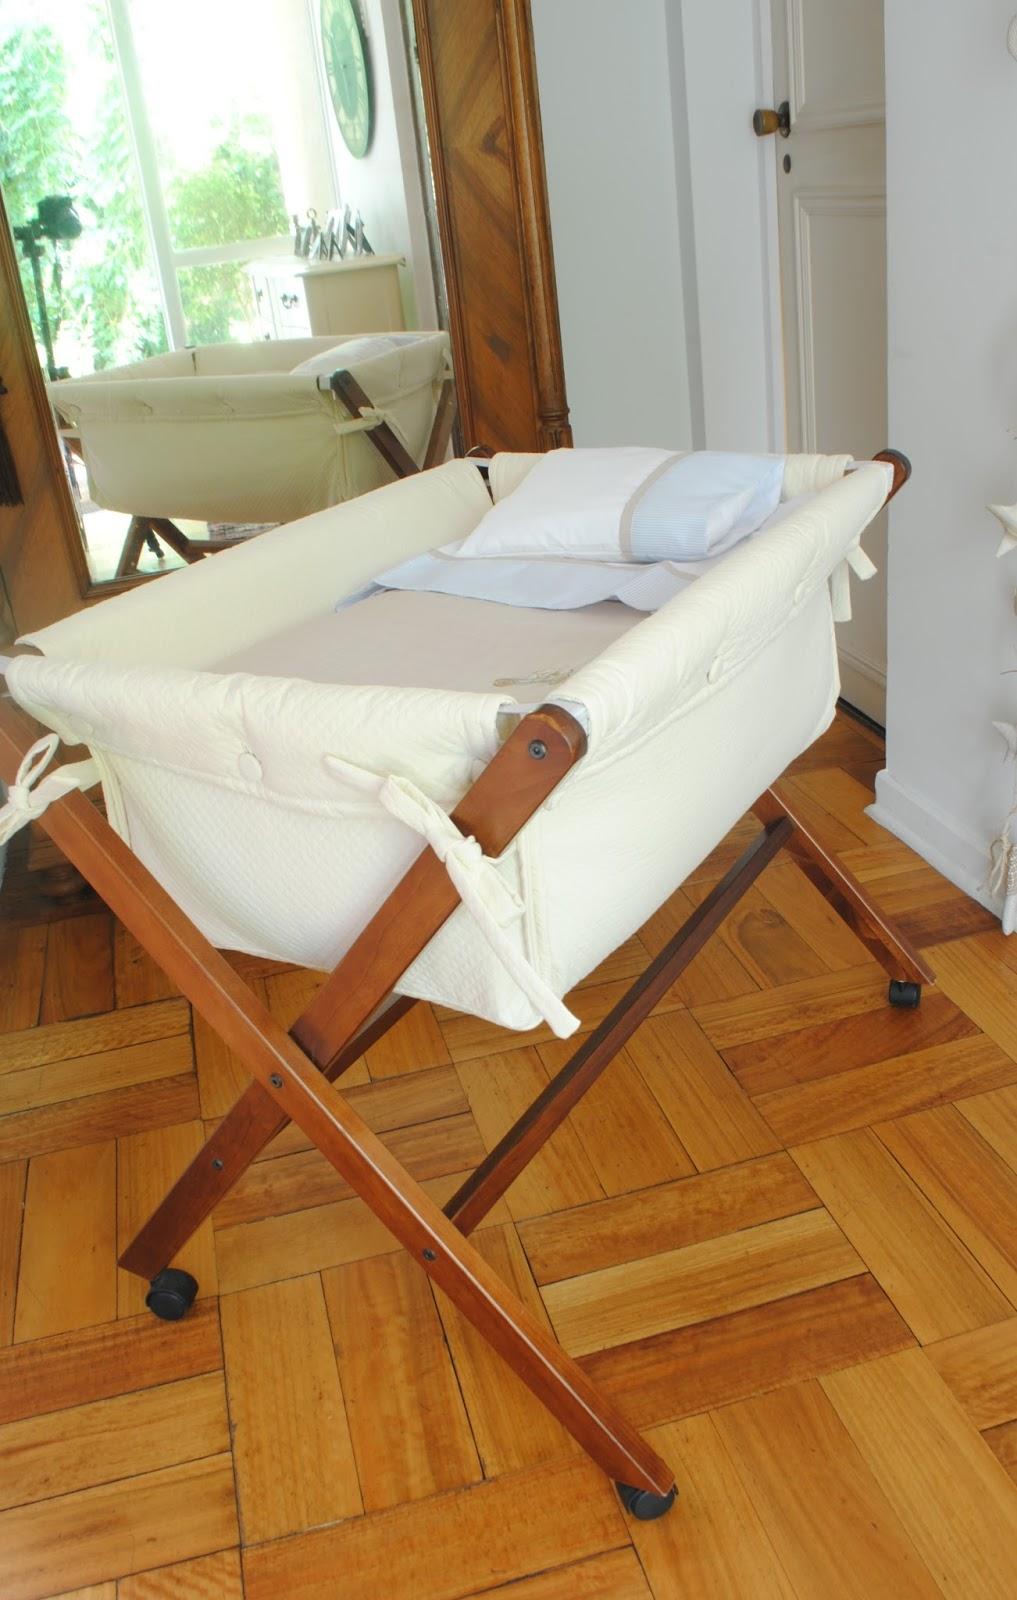 Asombroso Moisés Muebles Cunas Galería - Muebles Para Ideas de ...